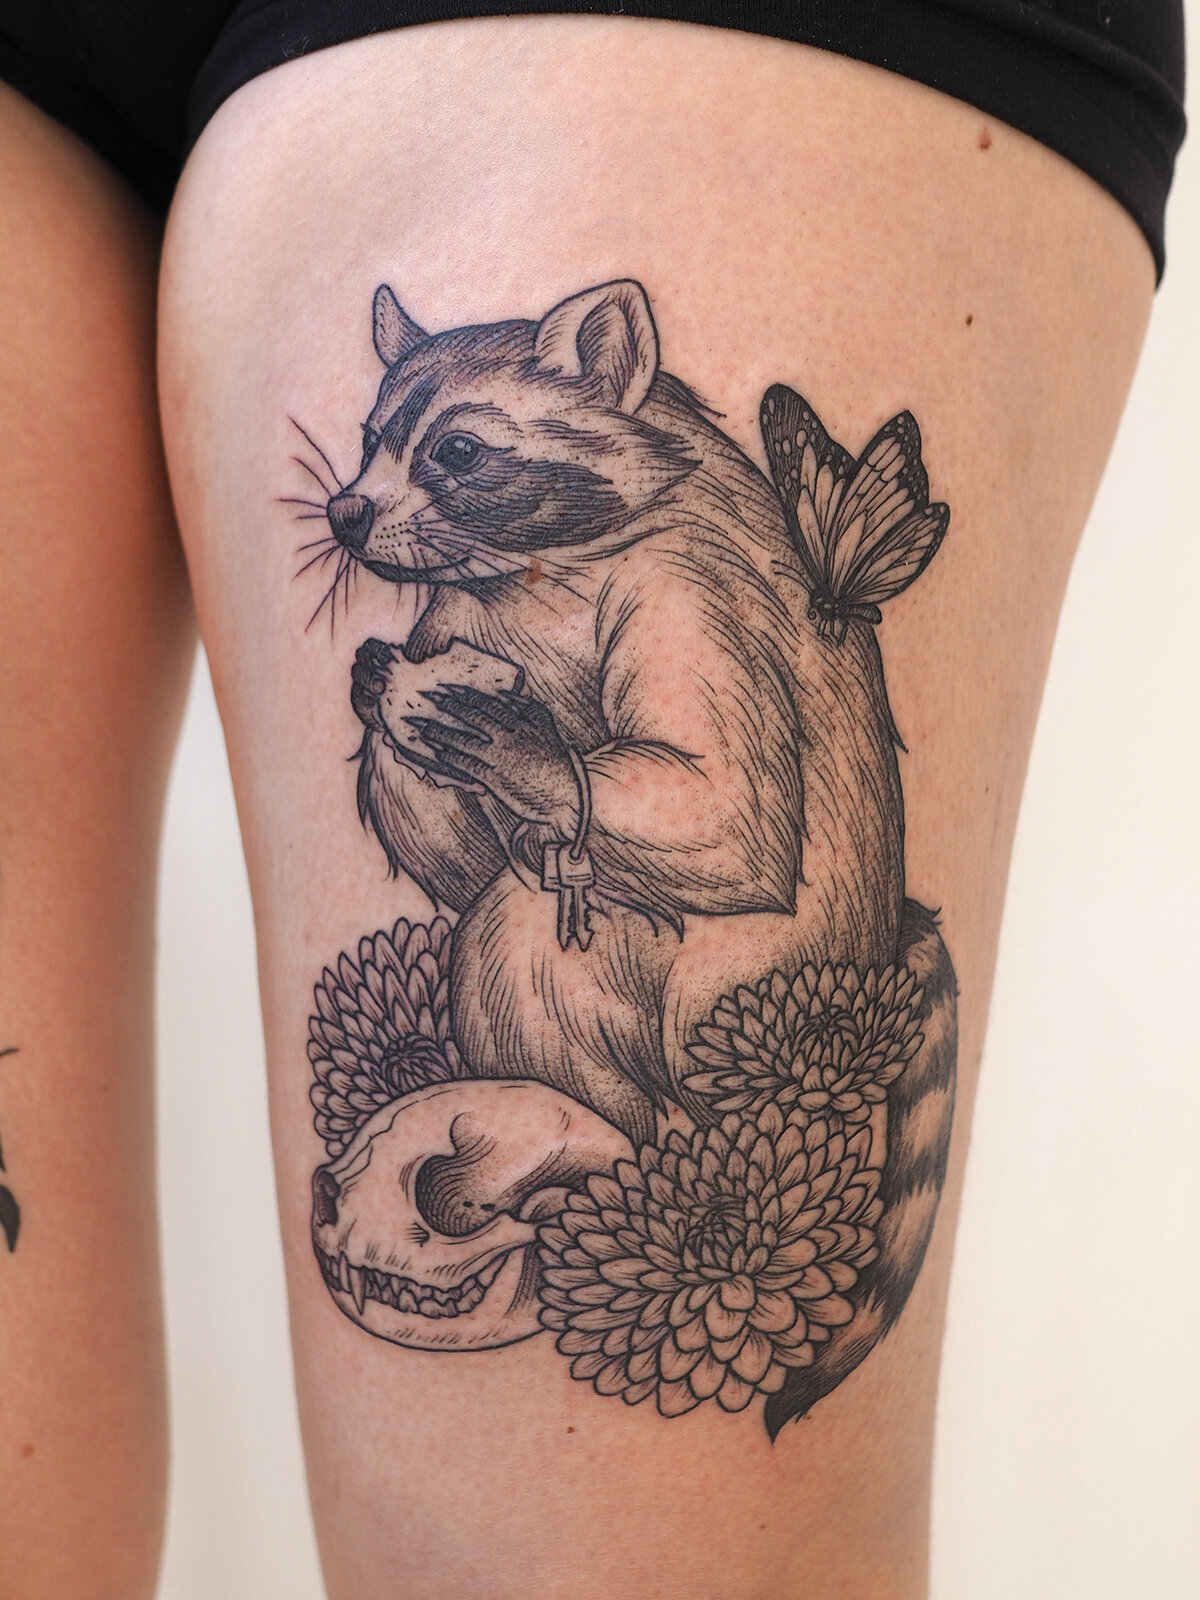 candace raccoon.jpg